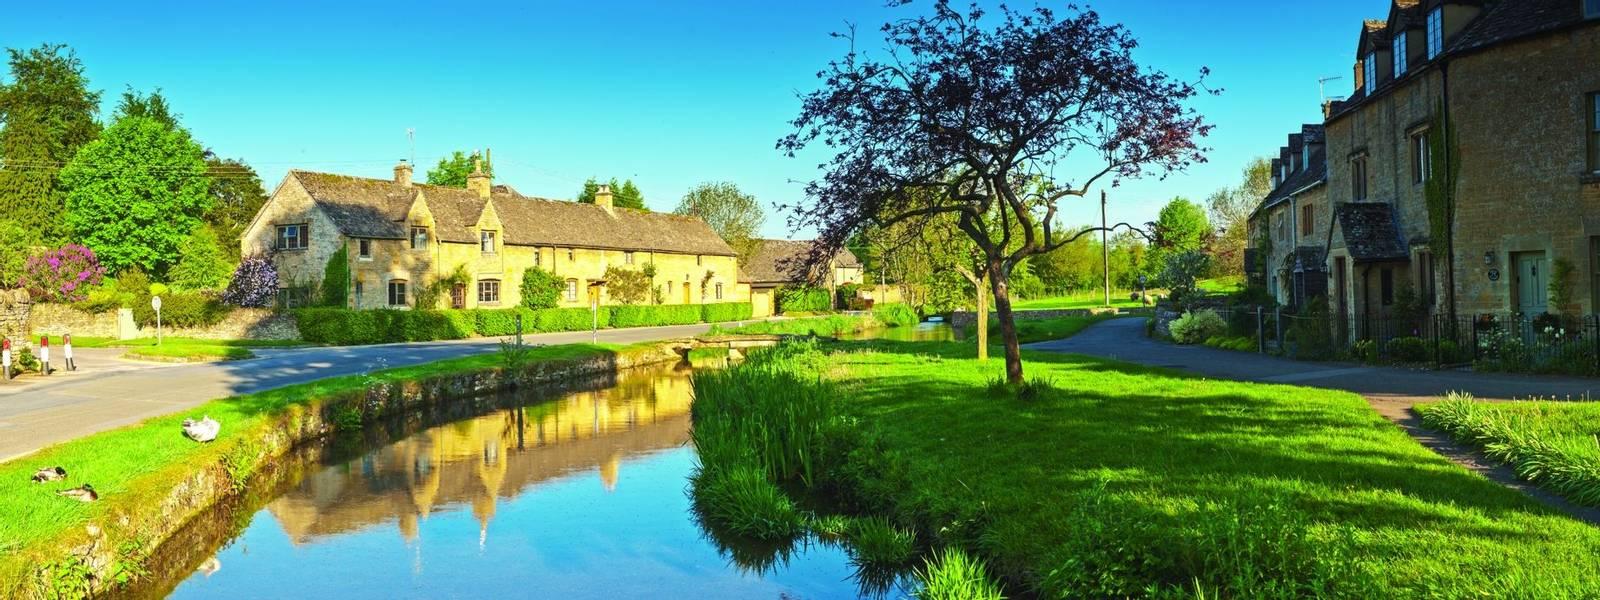 Rural homes, Cotswold, UK